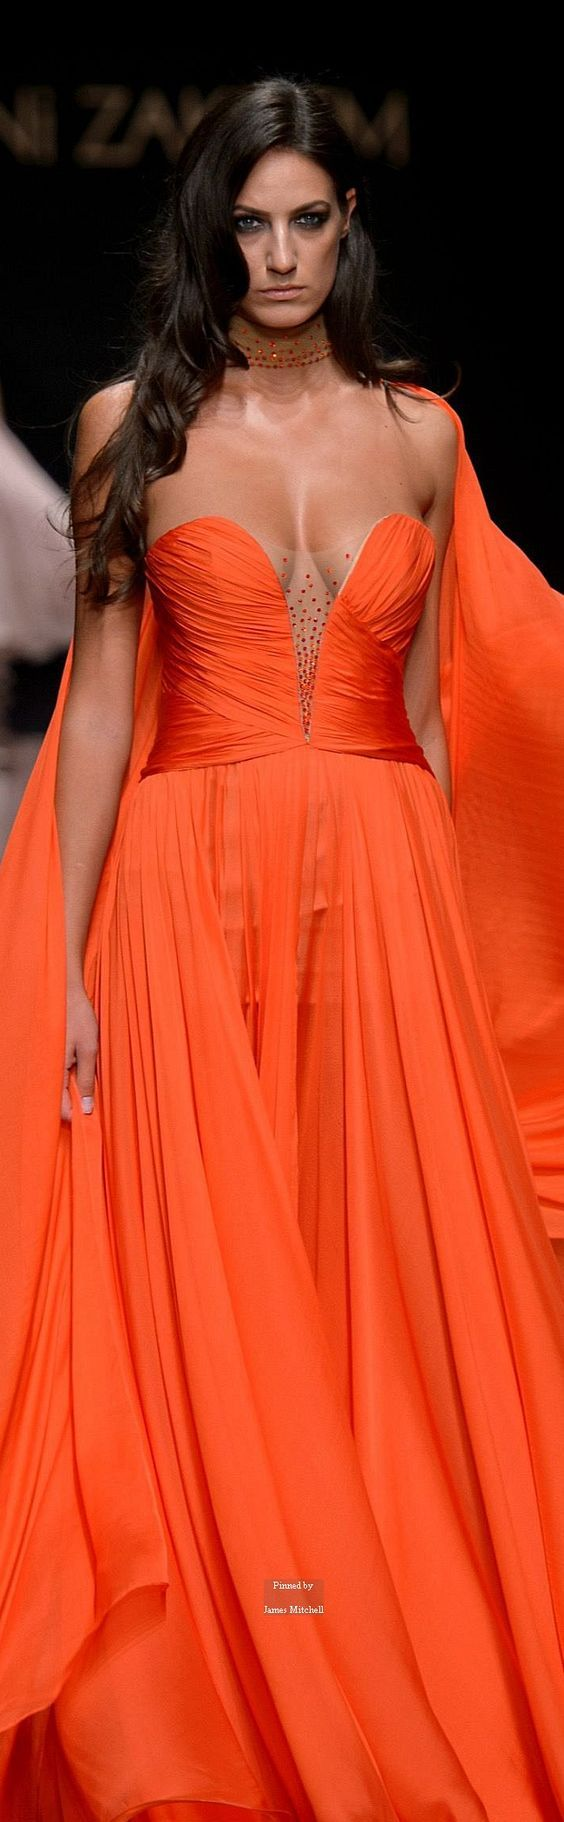 best elegant lady images on pinterest